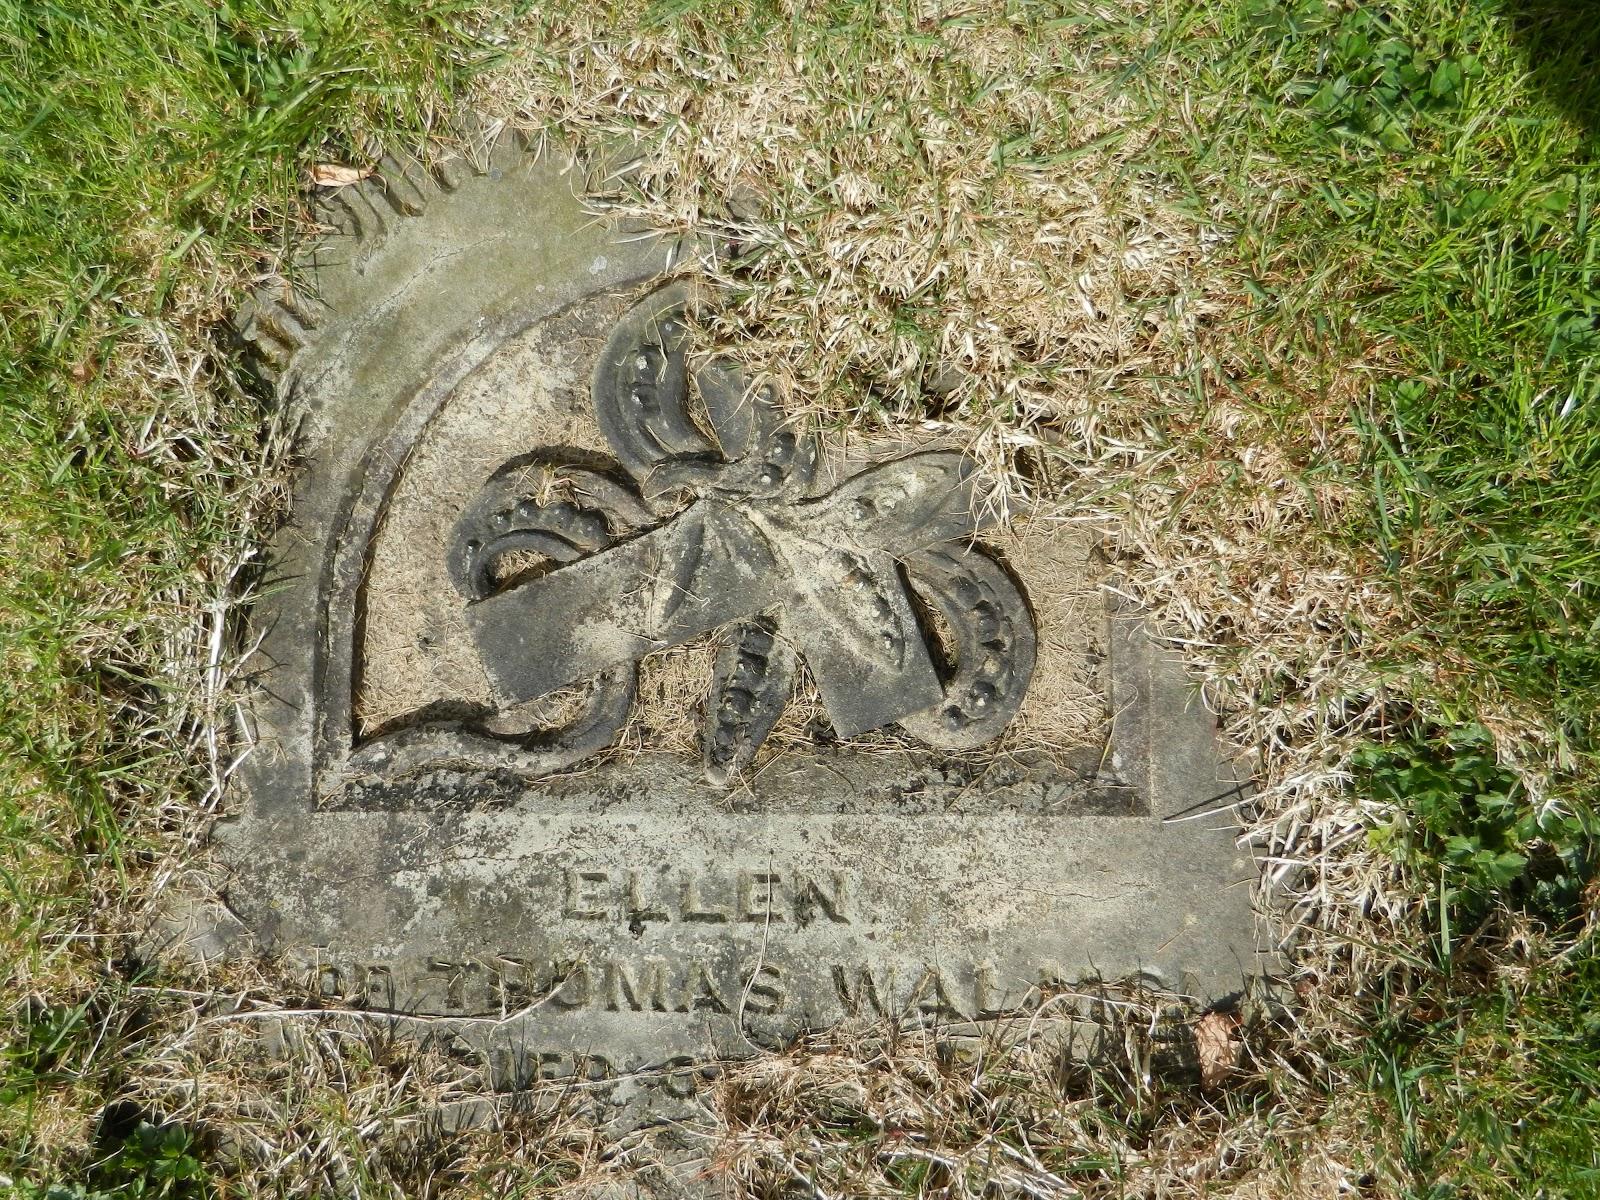 One of the overgrown headstones